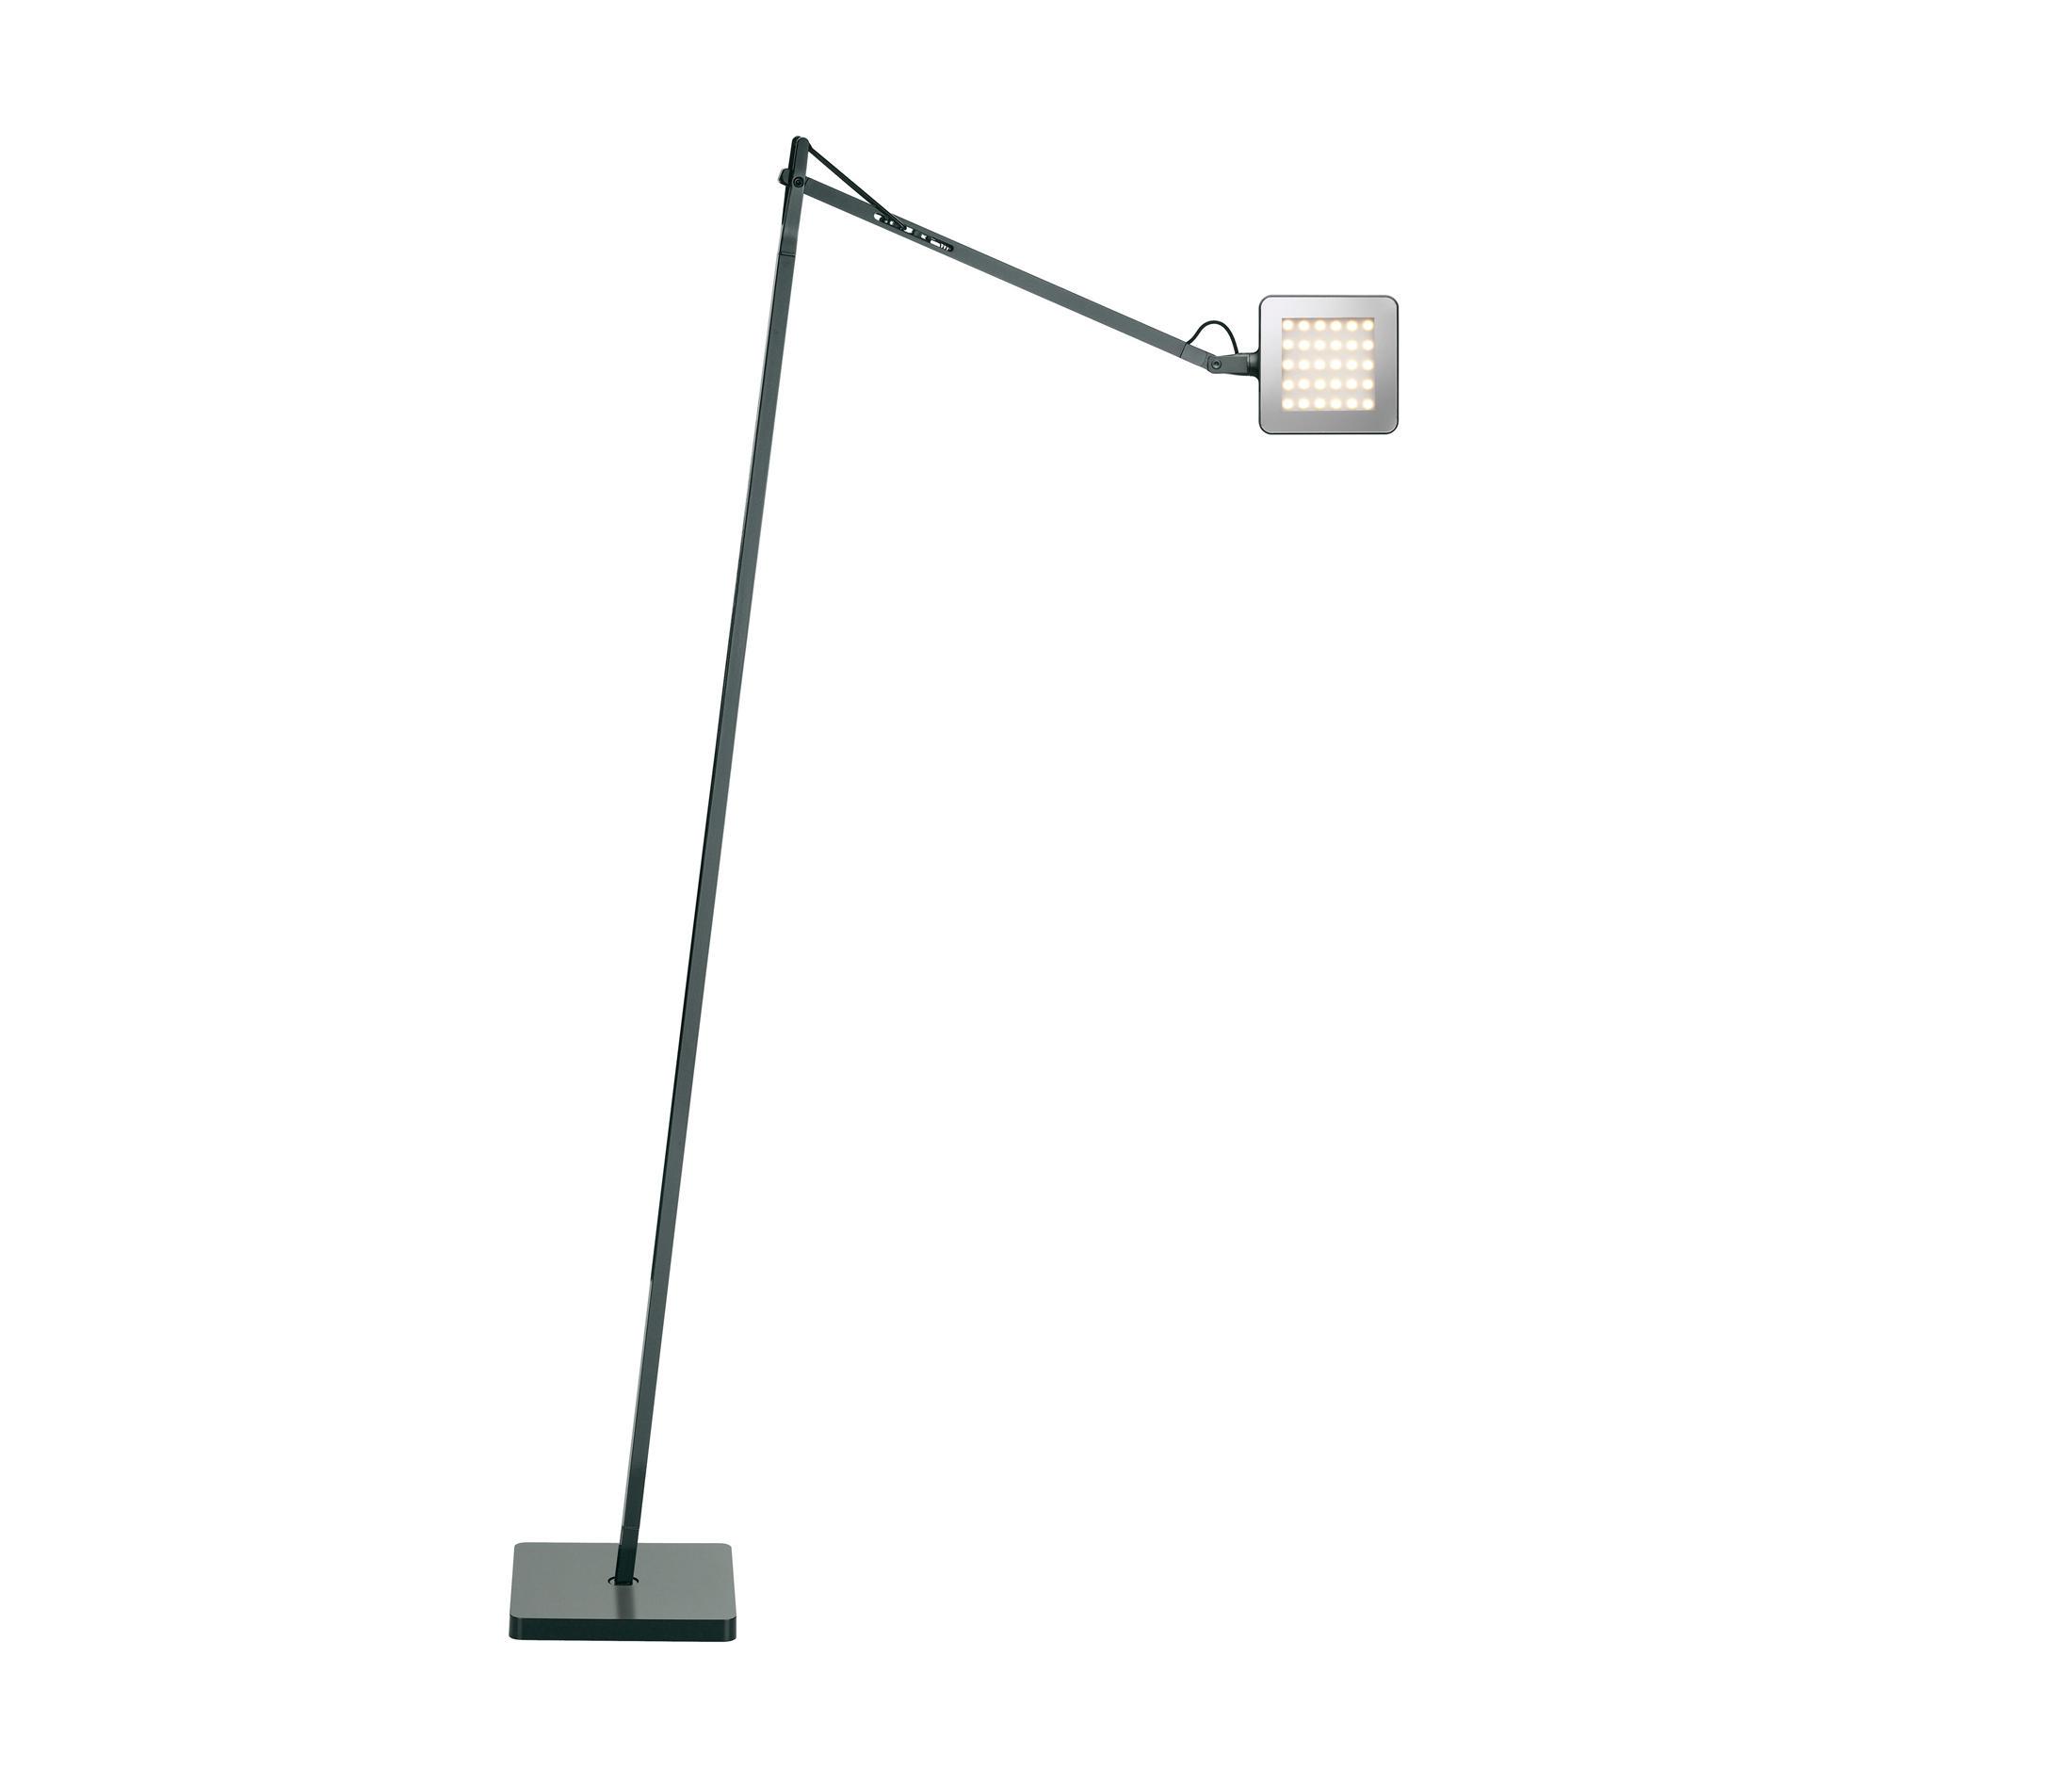 kelvin led f general lighting from flos architonic. Black Bedroom Furniture Sets. Home Design Ideas